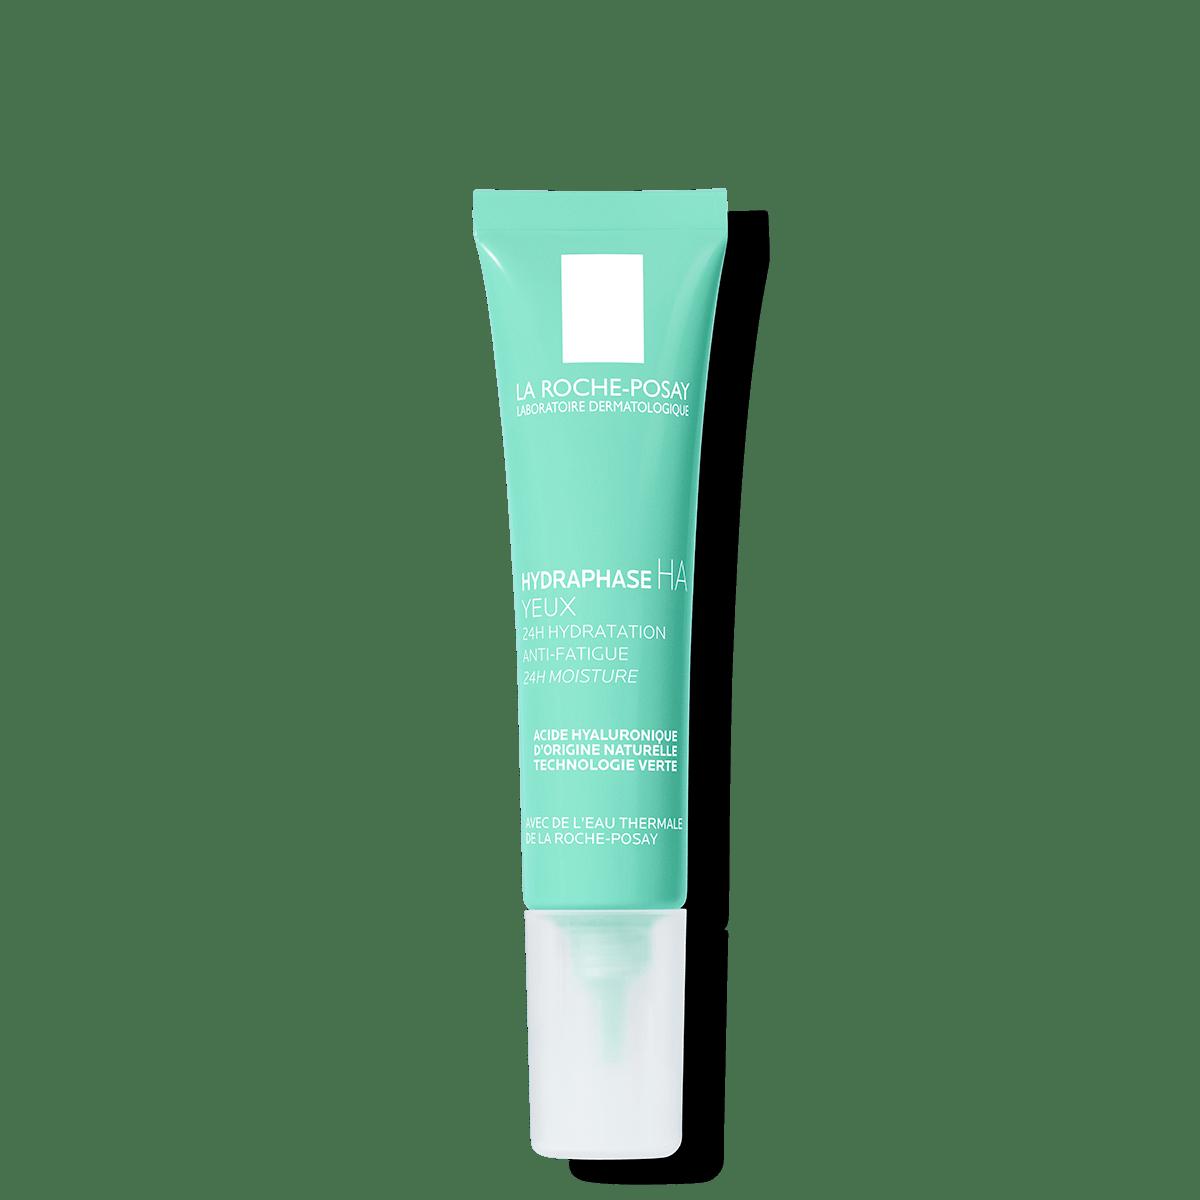 La Roche Posay ProduktSide Hydraphase Intens Øjne 15ml 3337872412646